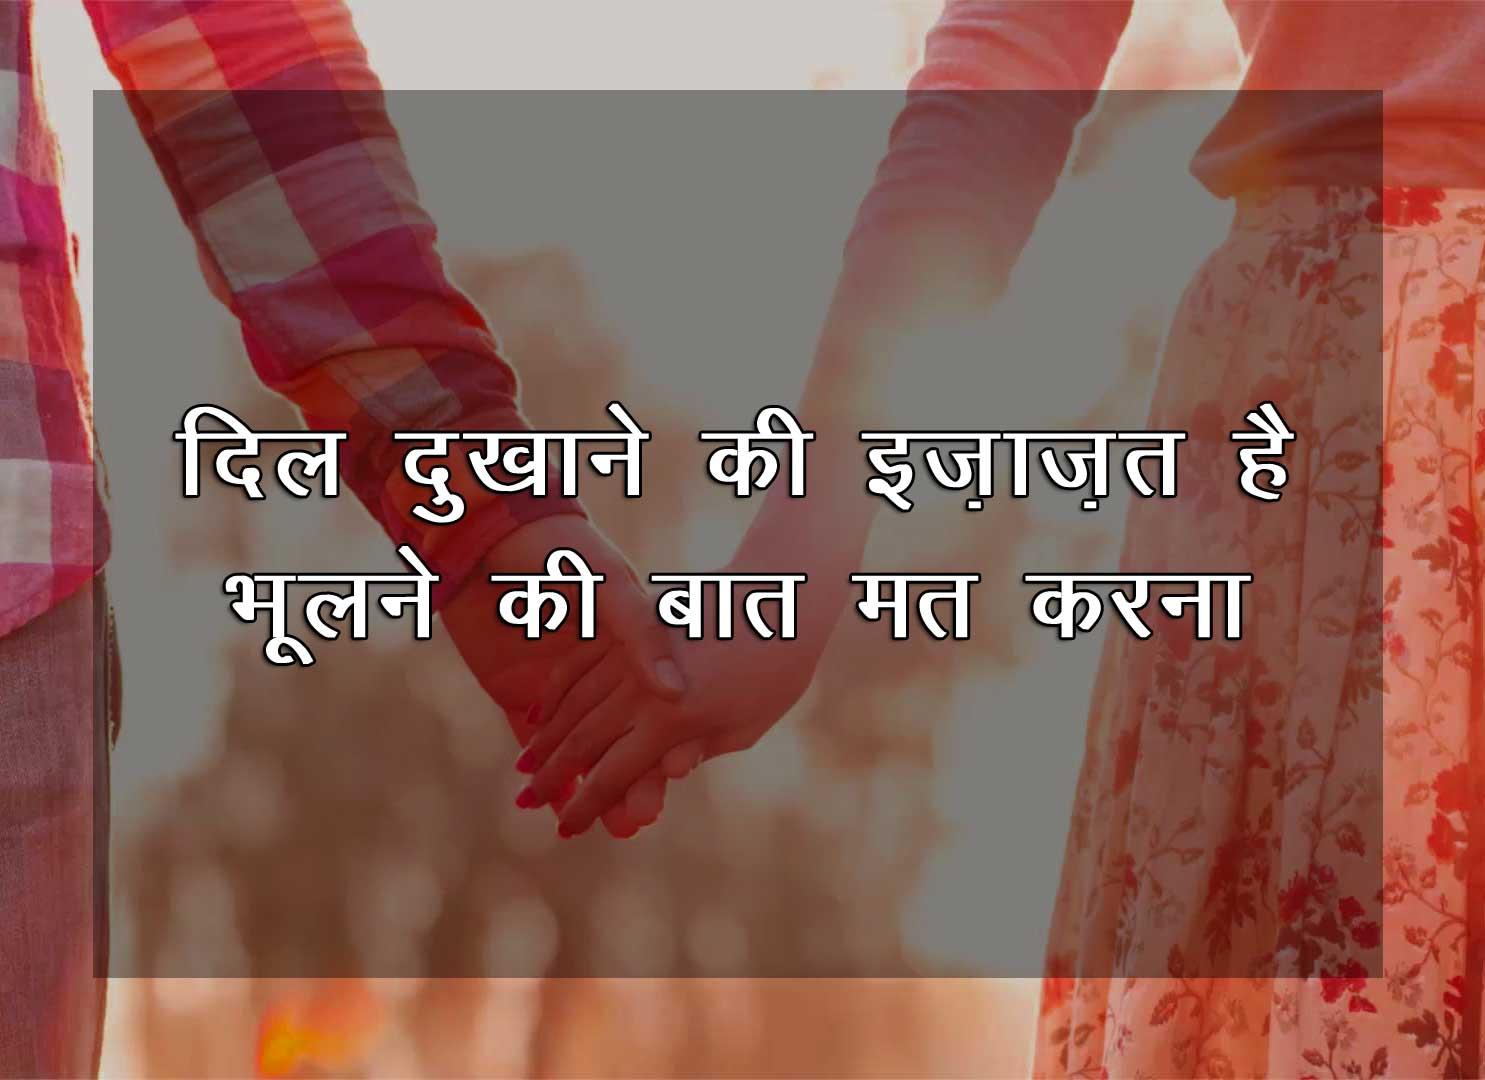 Romantic Love Shayari Pictures Download